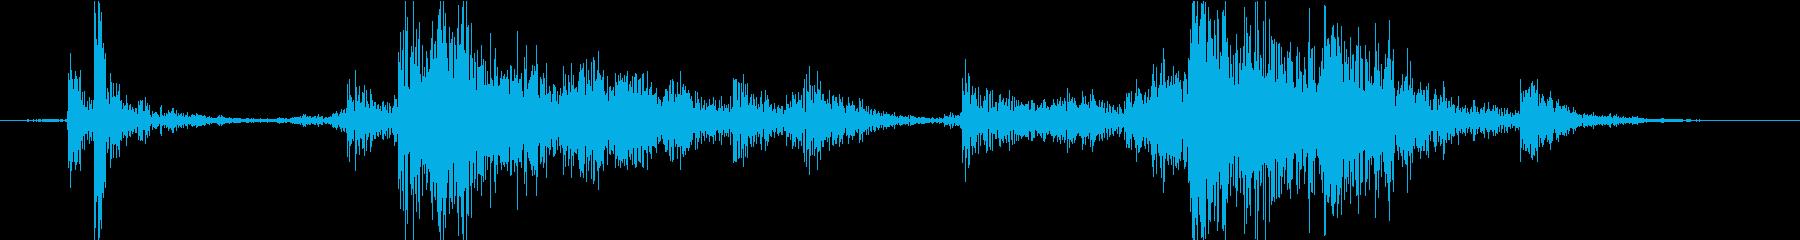 Material 道具箱の音 DIYの再生済みの波形